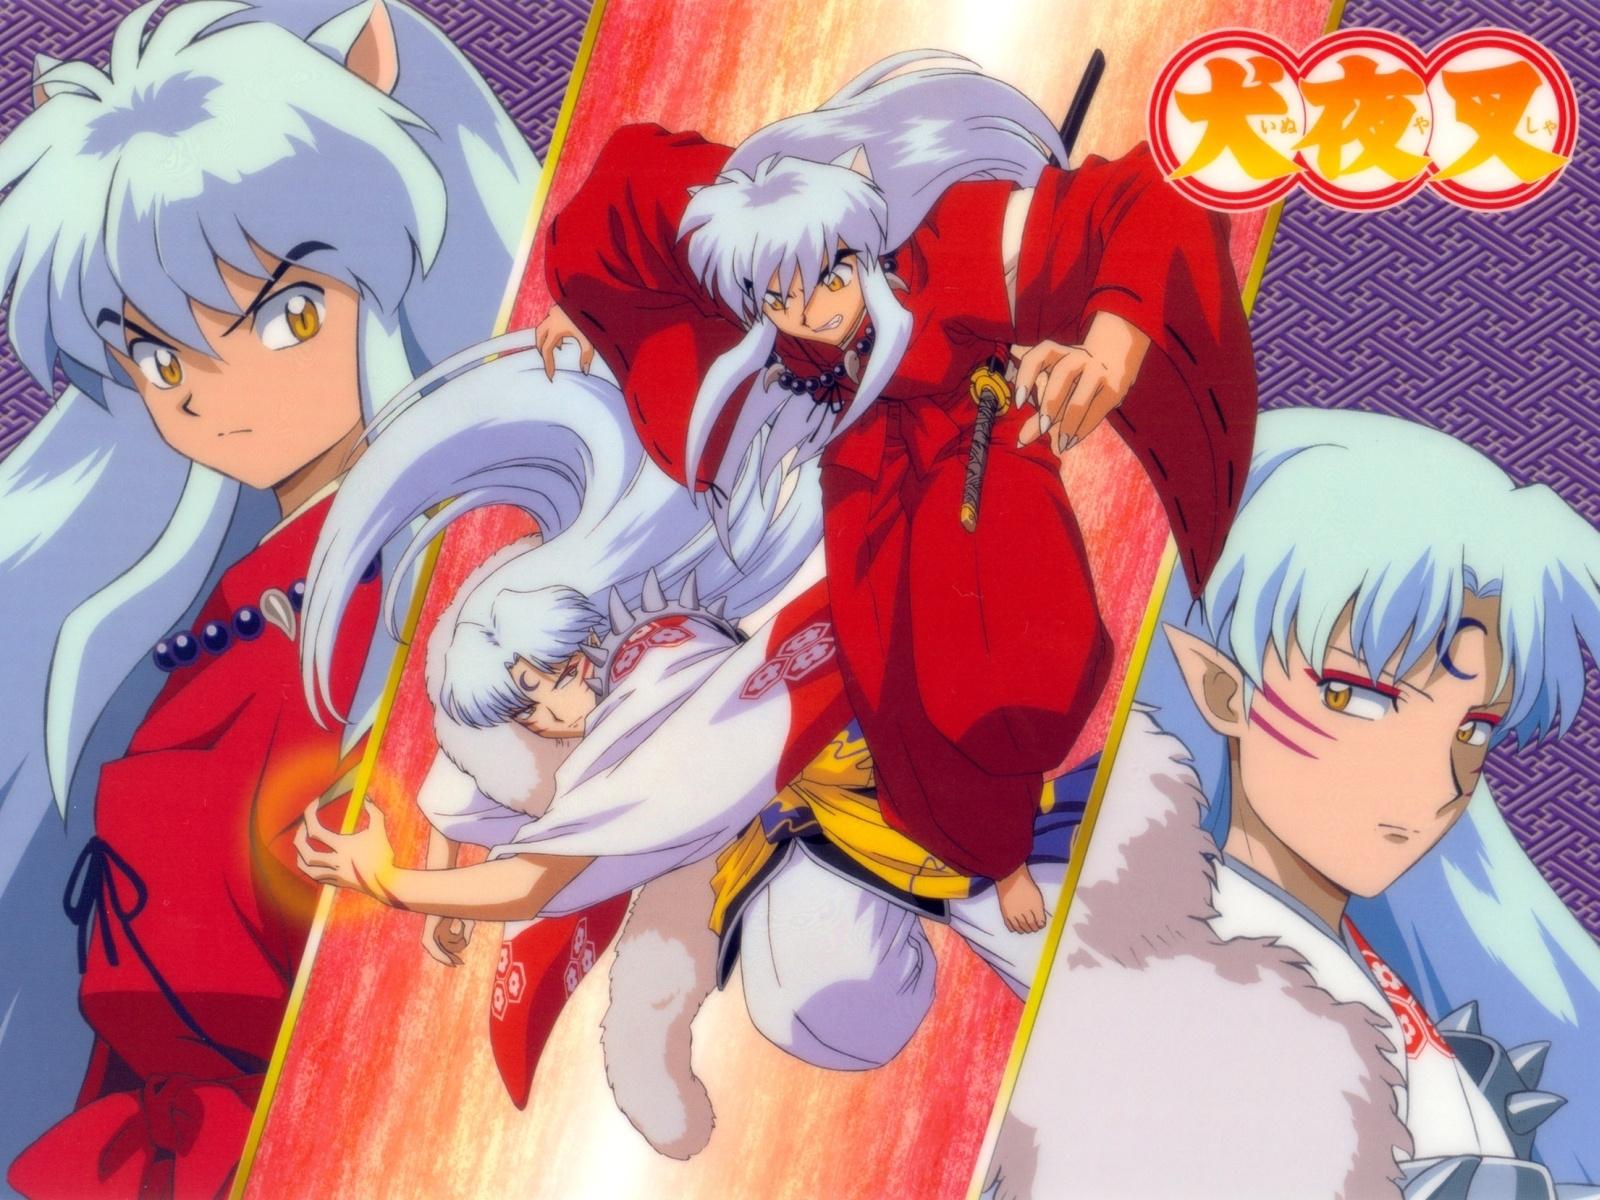 inuyasha and sesshomaru wallpaper | anime | pinterest | anime